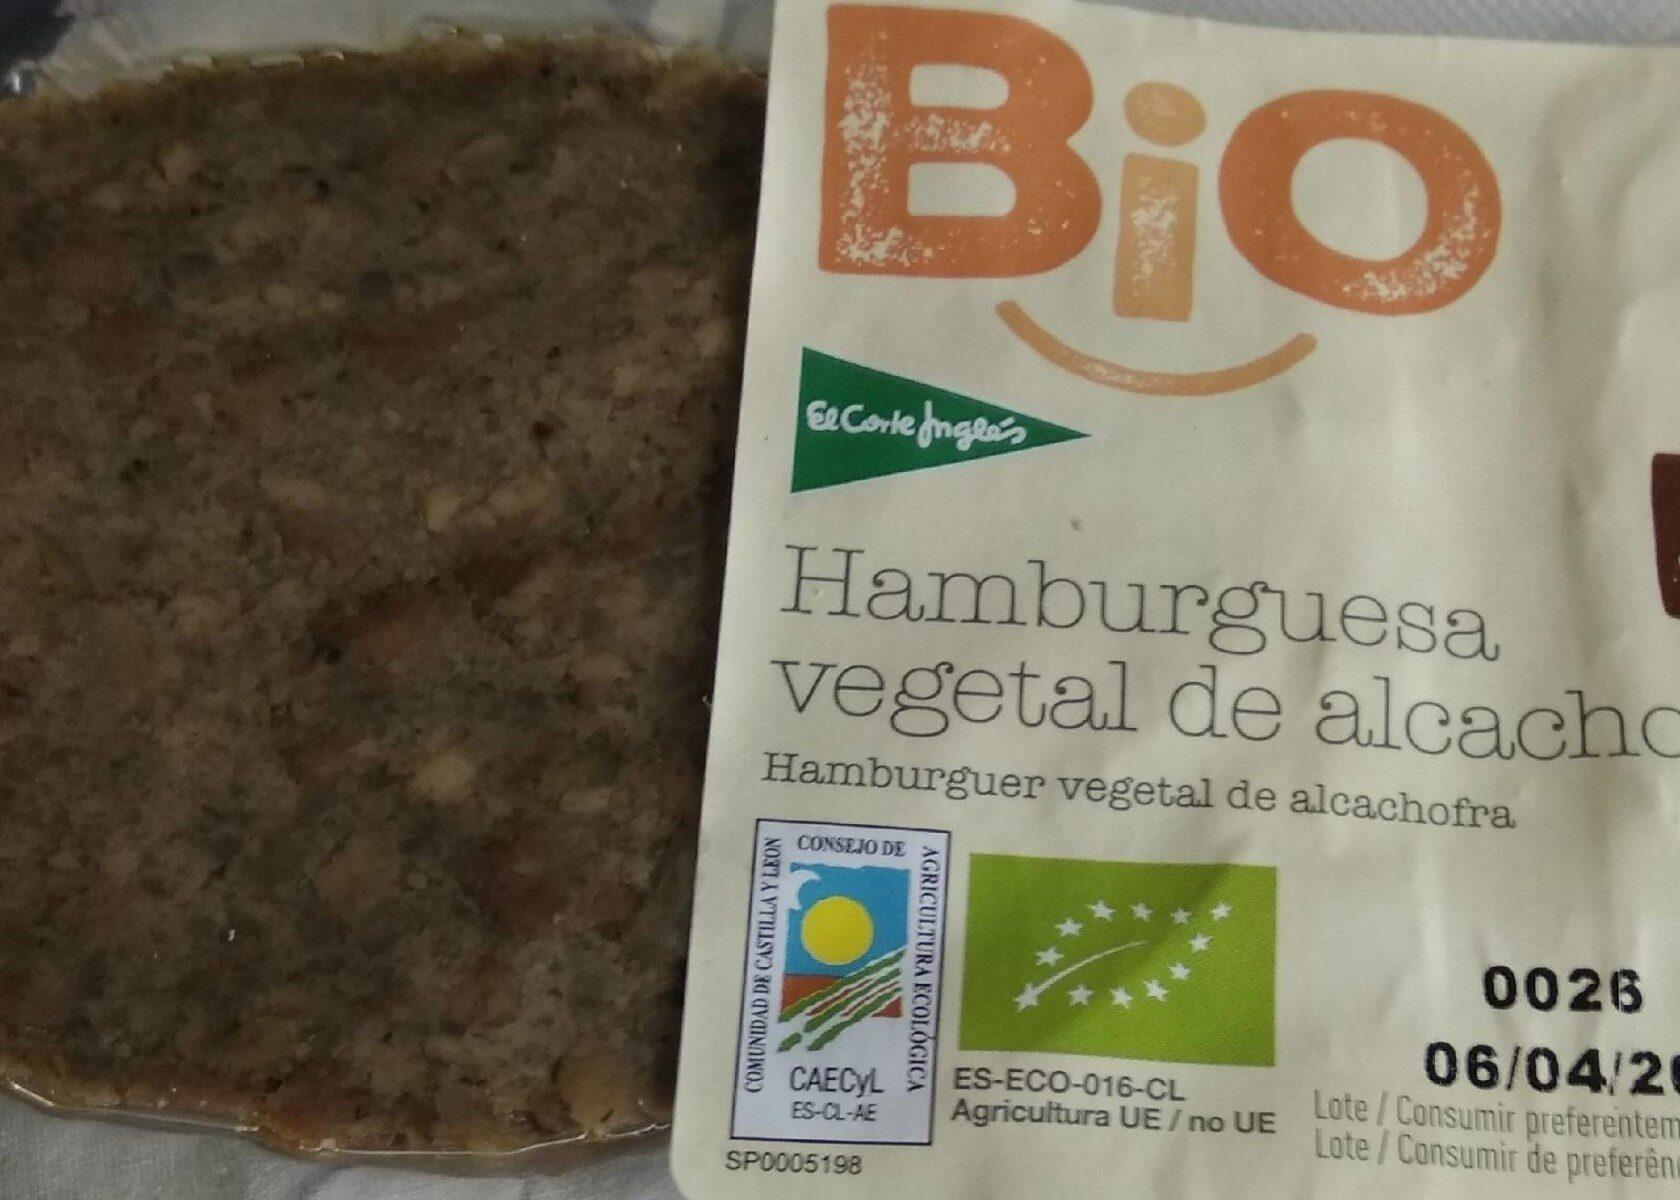 Bio Hamburguesa Vegetal de Alcachofa - Producto - es